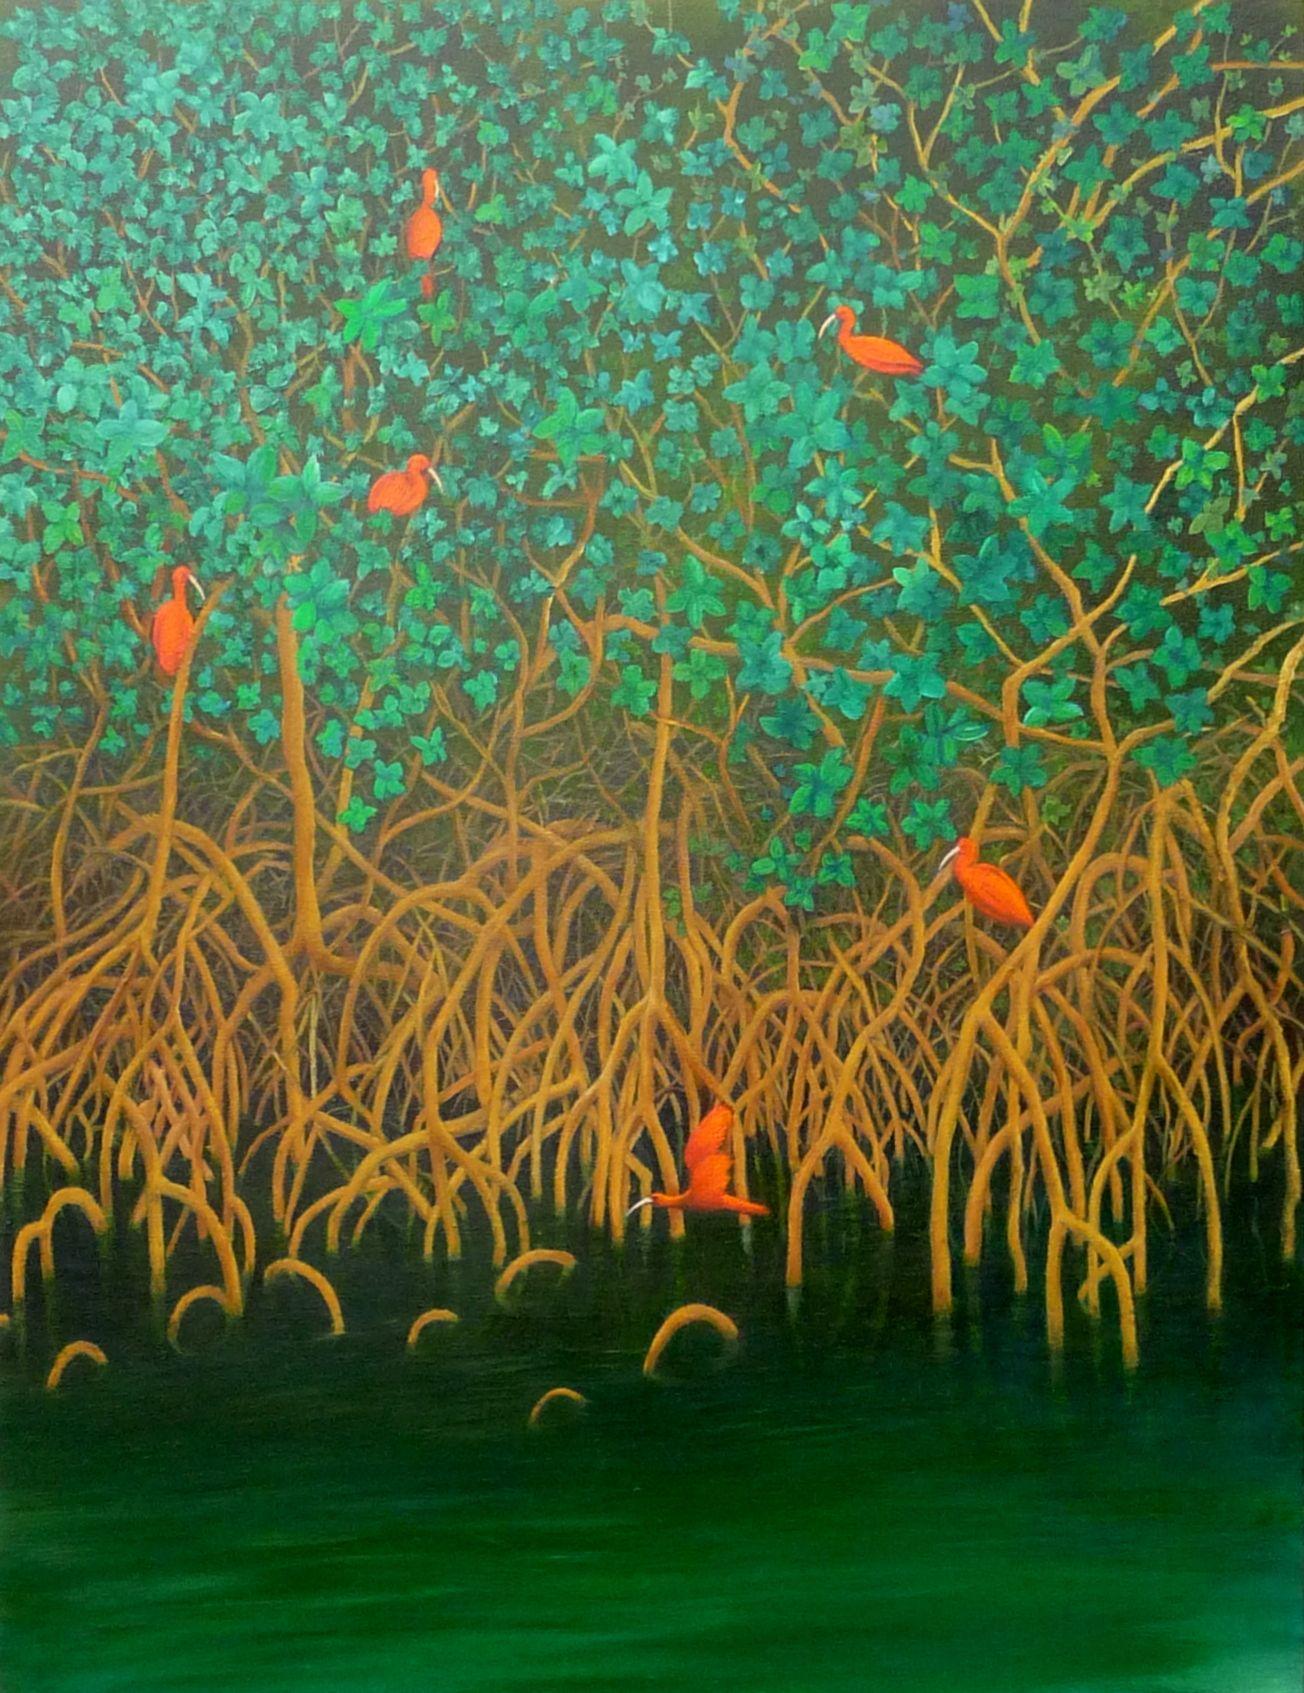 Quadro Pintura By Jorge Marcovich Passaro Guara No Mangue Ibis On